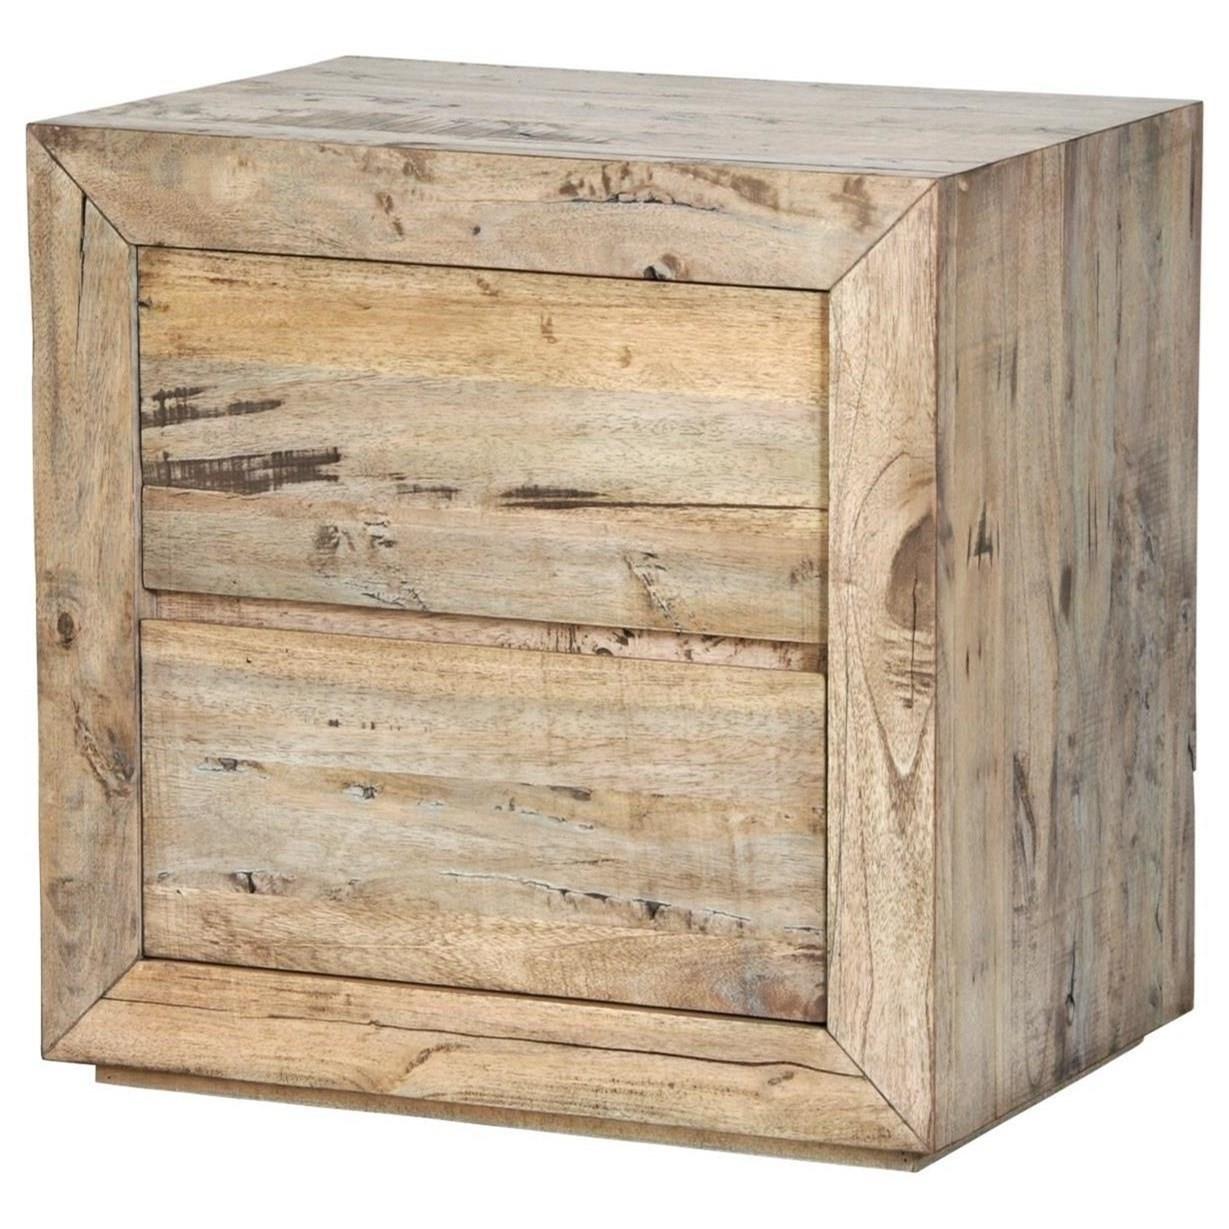 Renewal 2 Drawer Nightstand by Napa Furniture Designs at HomeWorld Furniture